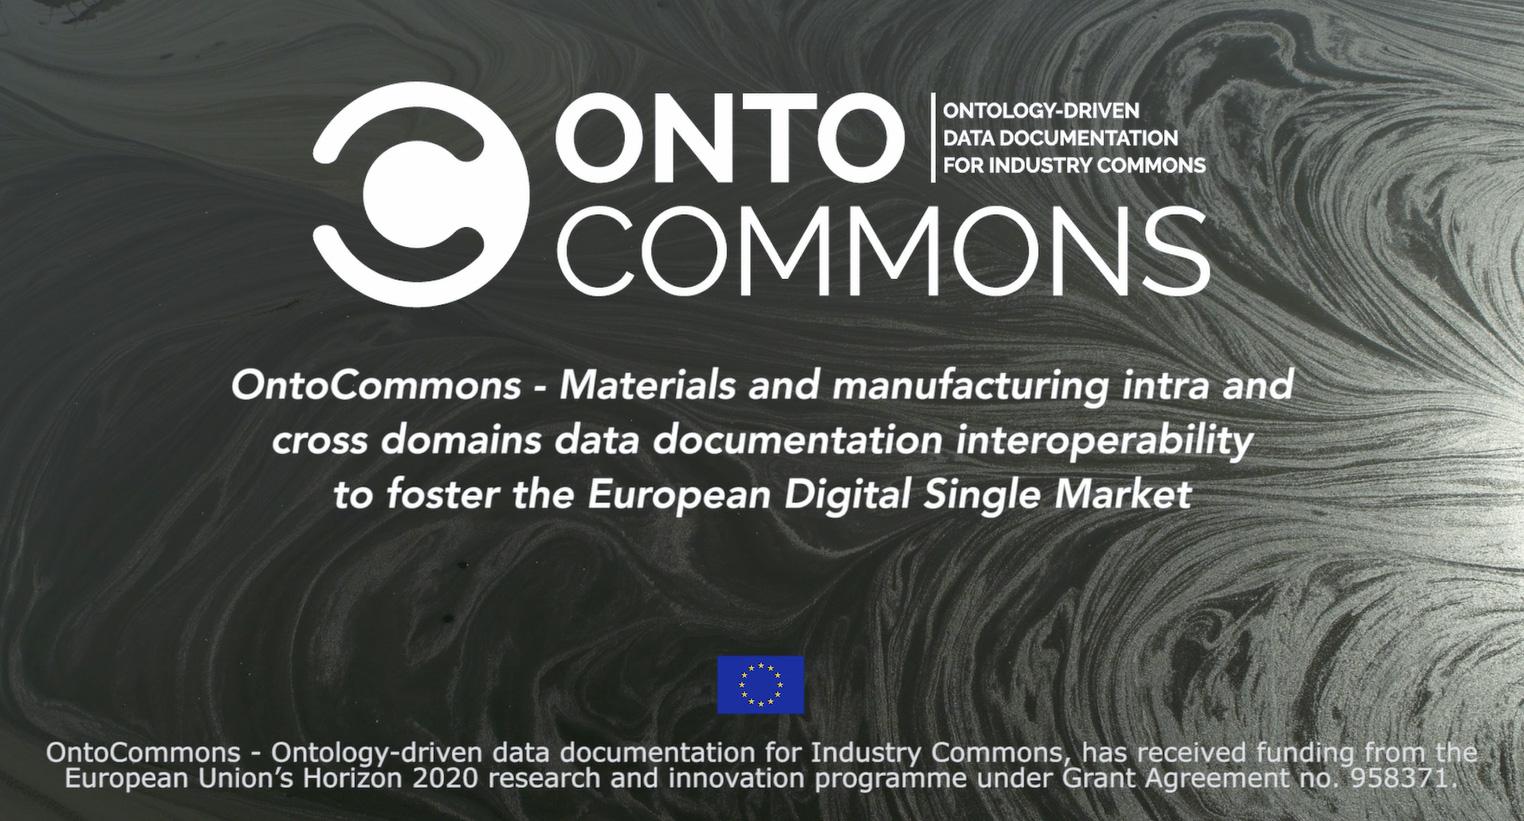 https://ontocommons.eu/sites/default/files/revslider/image/OntoCommons-video-cover-youtube.jpg